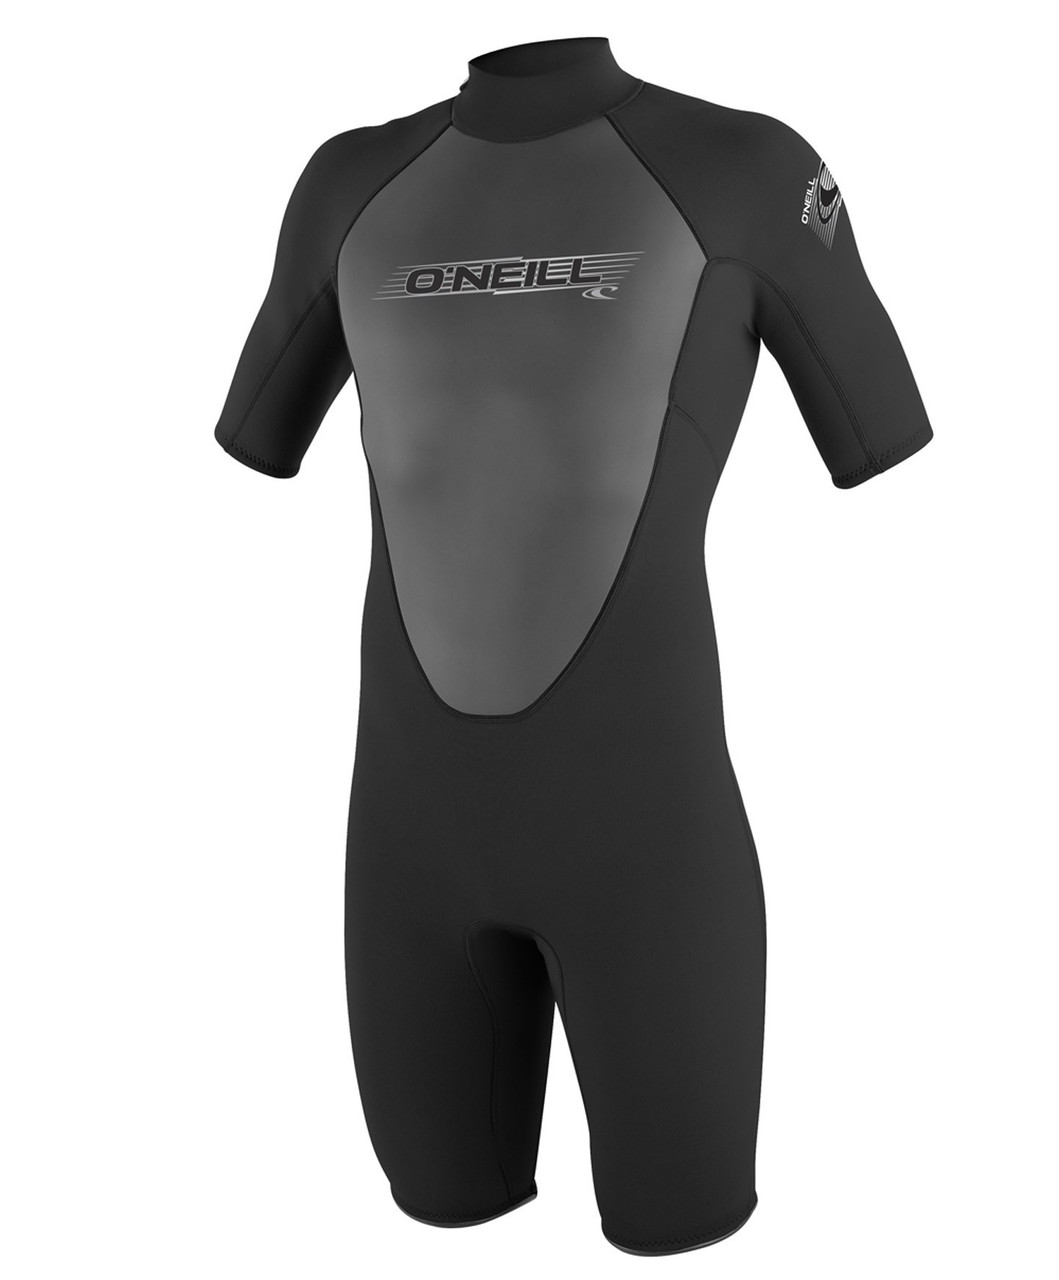 O'NEILL Men's Reactor Spring Wetsuit